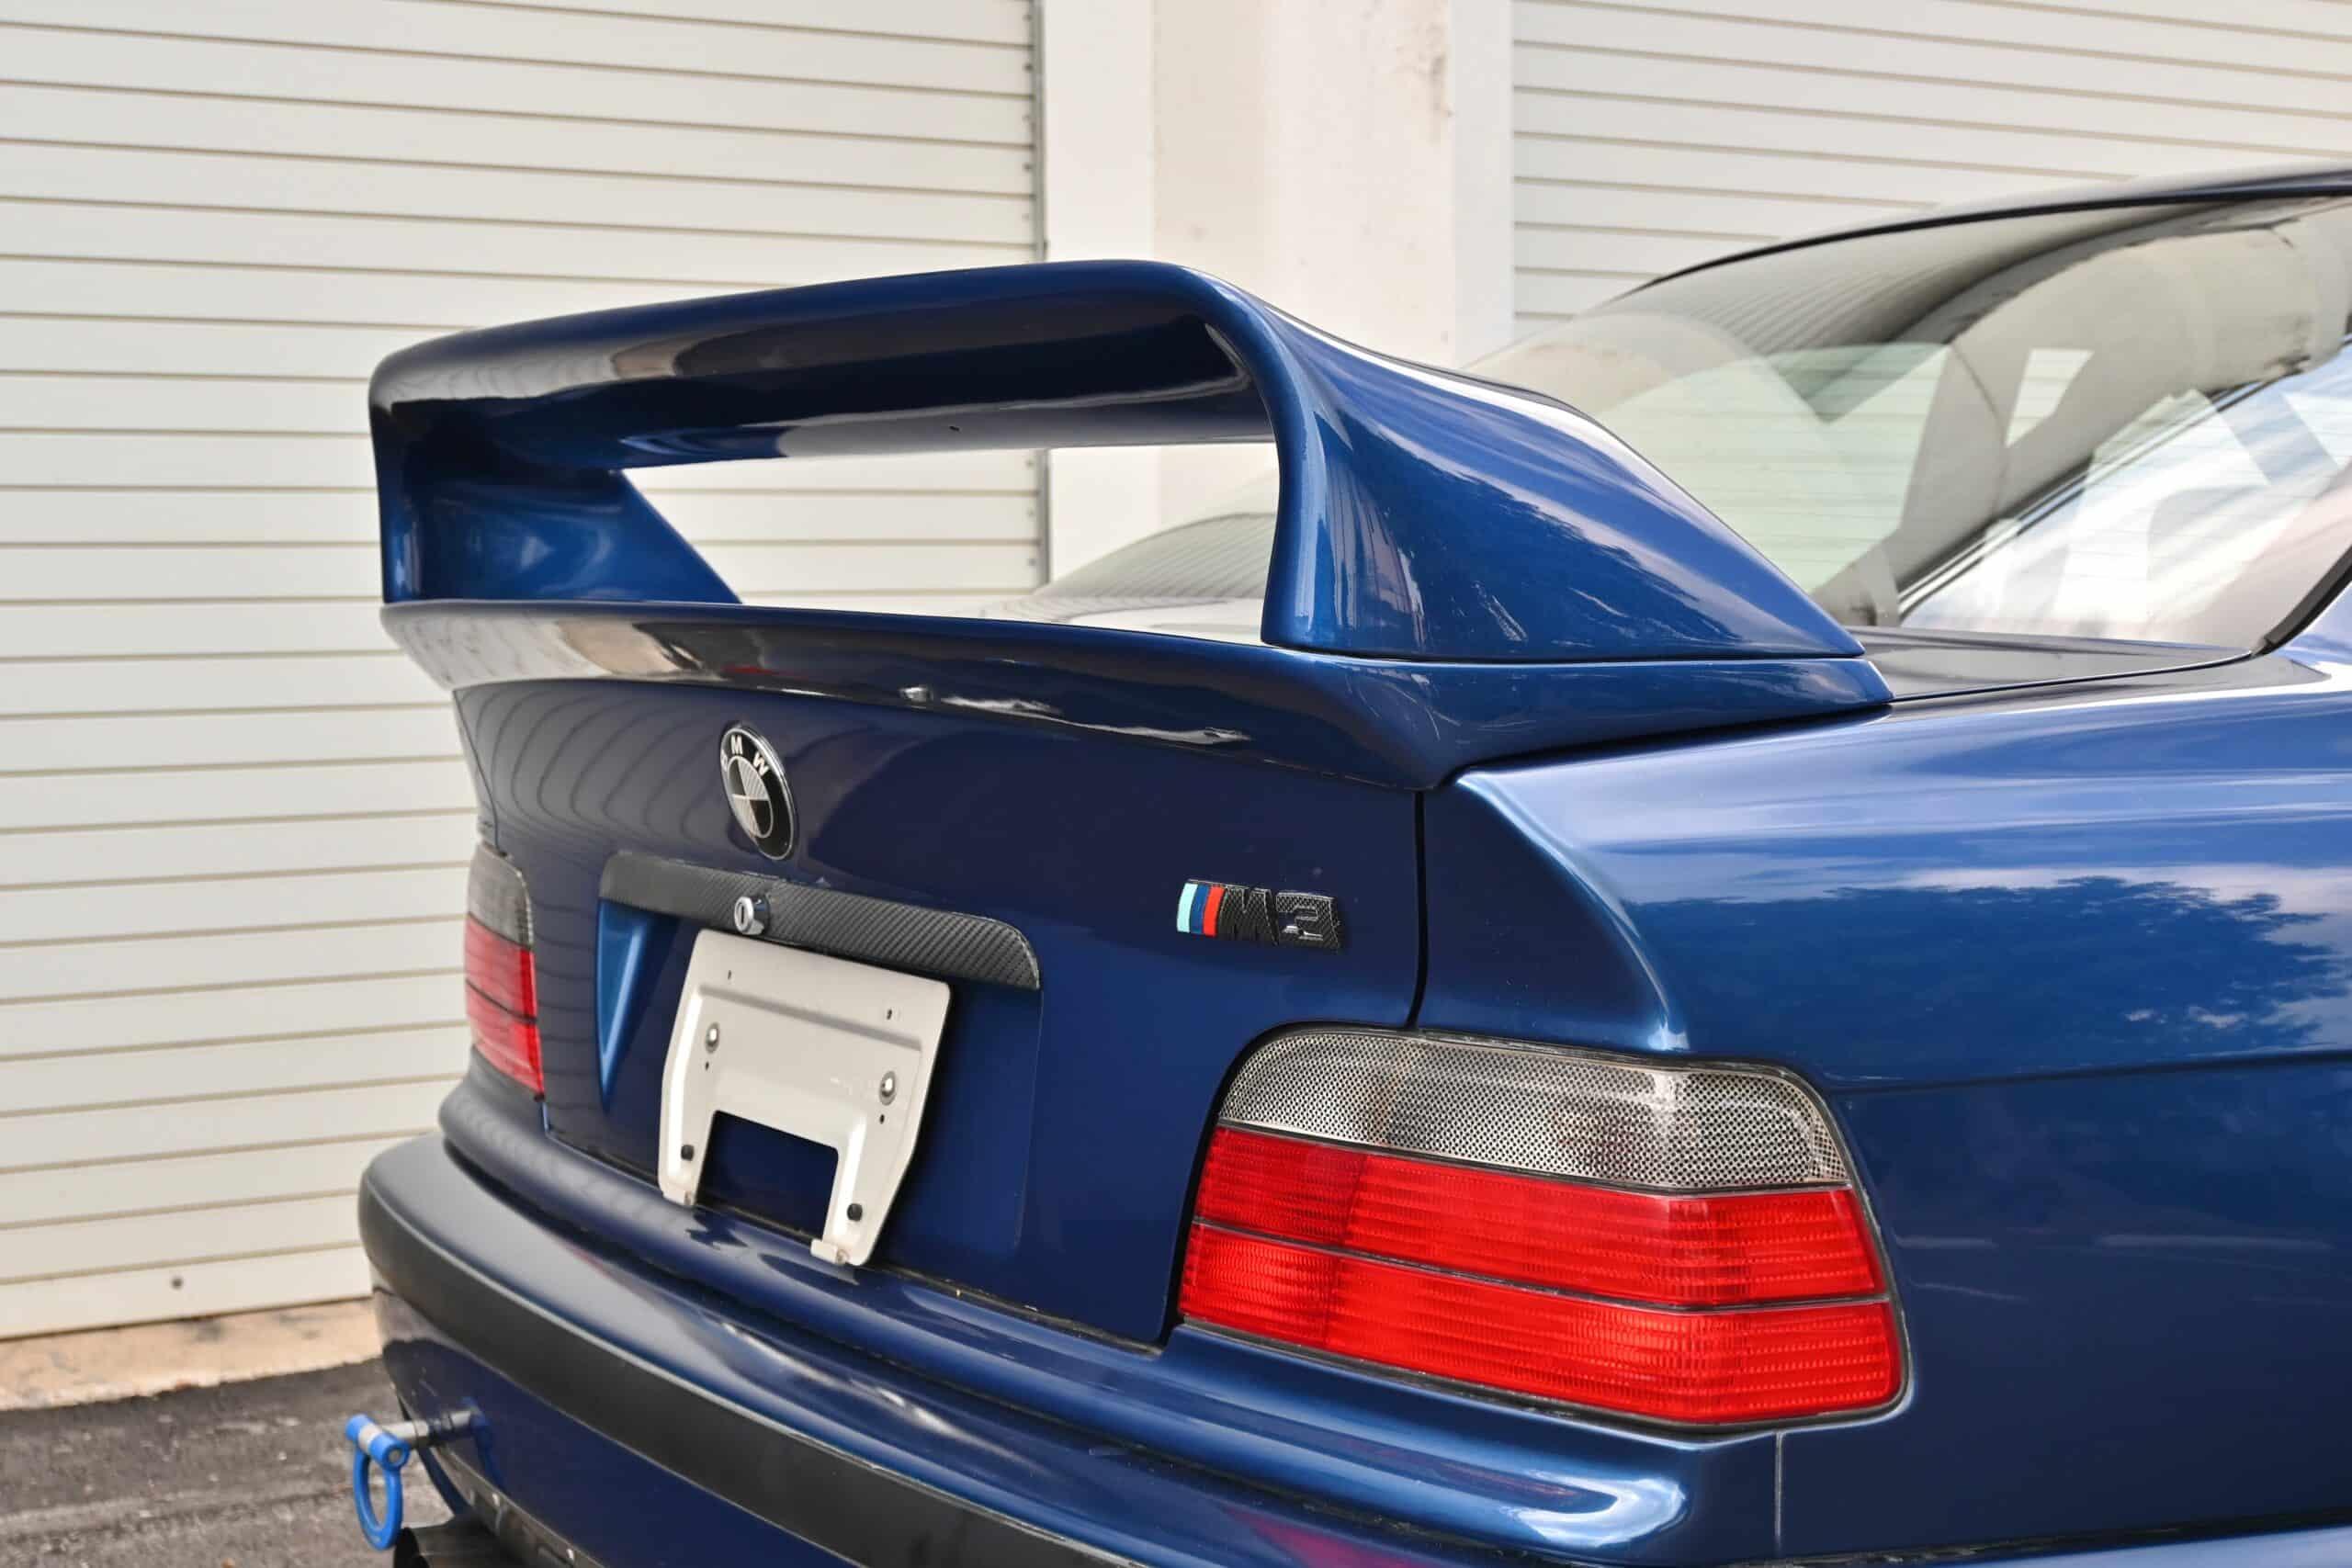 1994 BMW M3 Euro E36 Euro S50 300+ hp   Dual Purpose   OS Giken   Titanium   Lightweight   Recaros